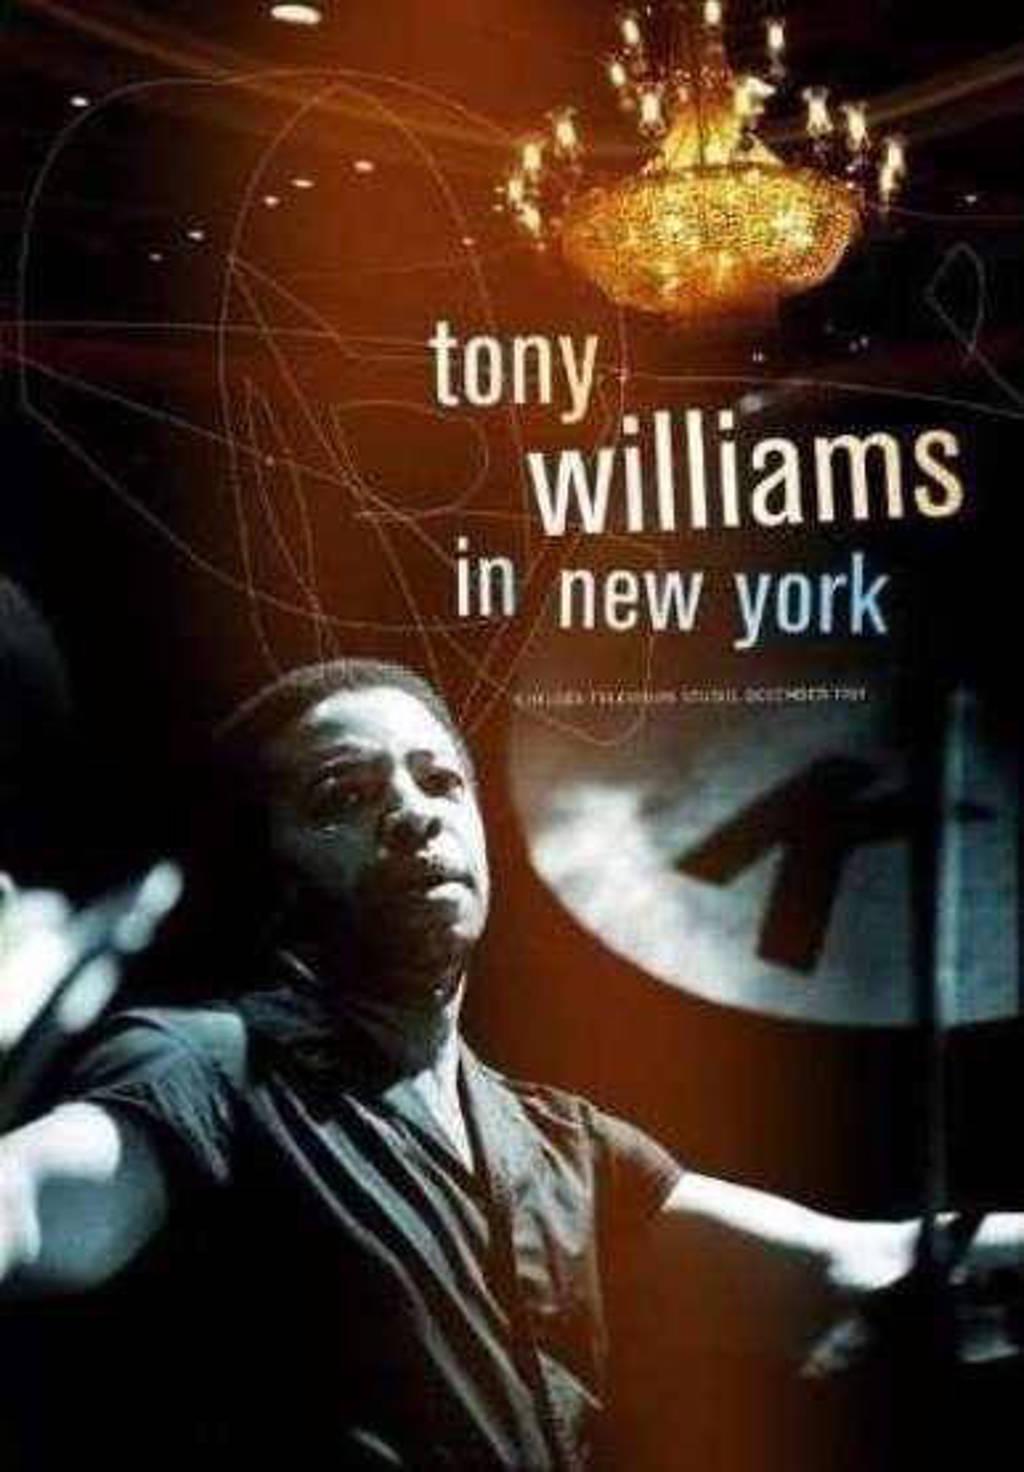 Tony Williams - In New York, December 15, 1989 (DVD)